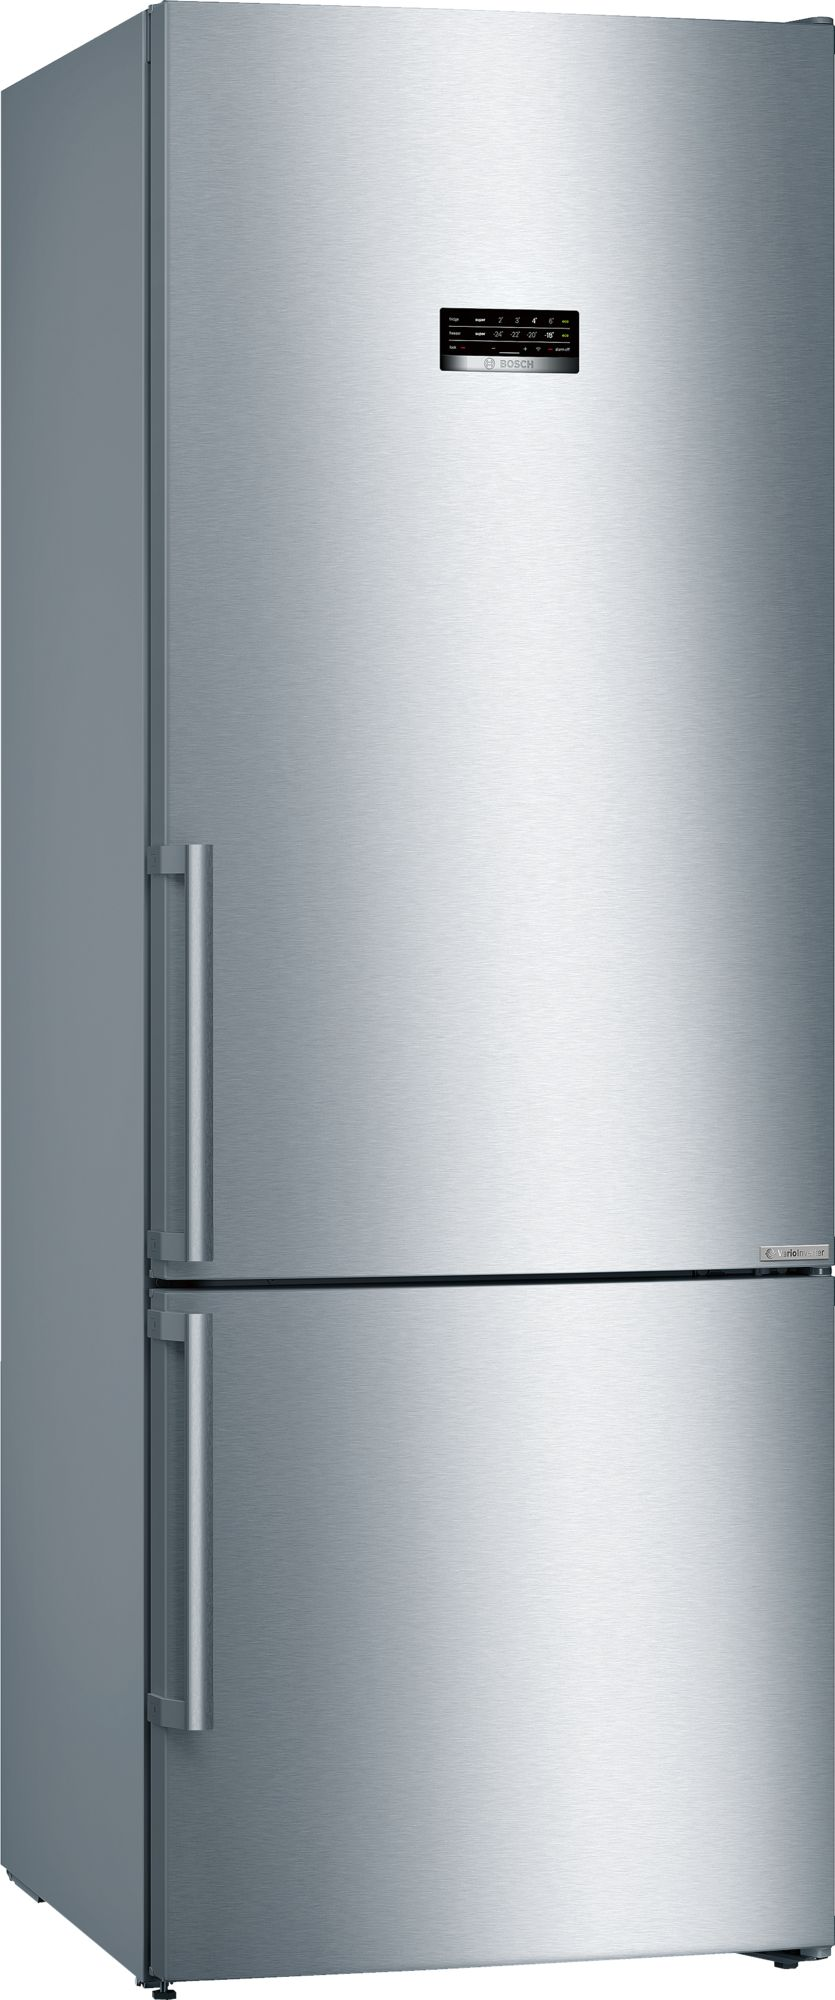 BOSCH ตู้เย็น รุ่น KGN56XI40J